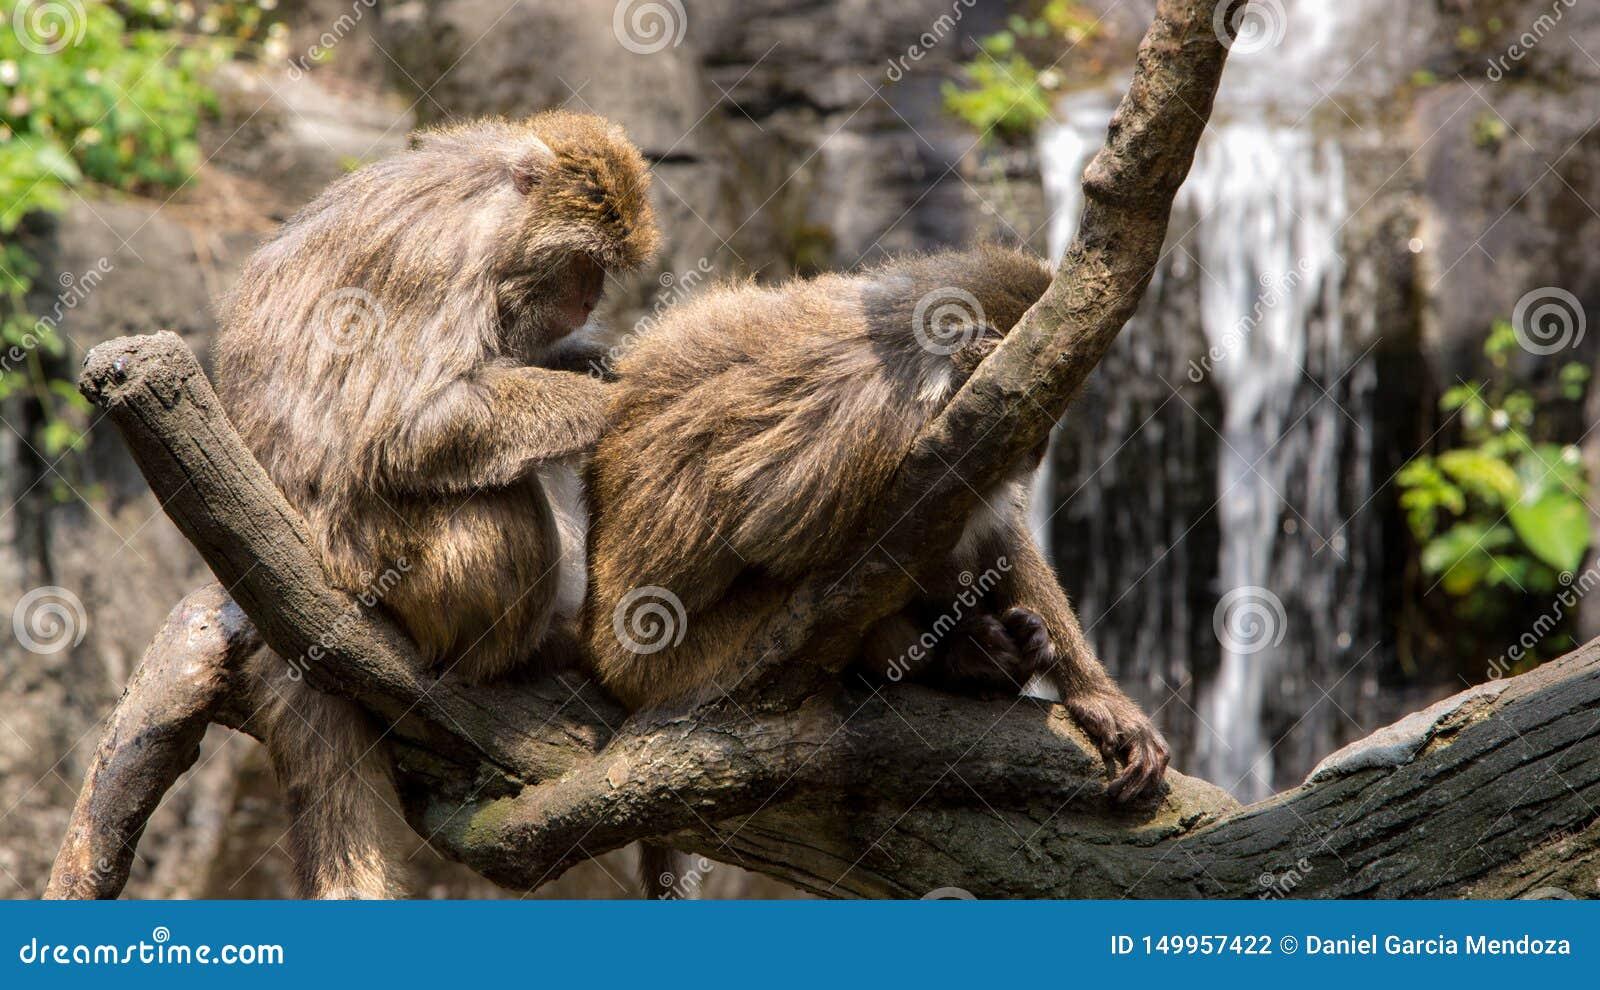 Formosan συνεδρίαση βράχου δύο macaque στο δέντρο και καλλωπισμός με έναν καταρράκτη